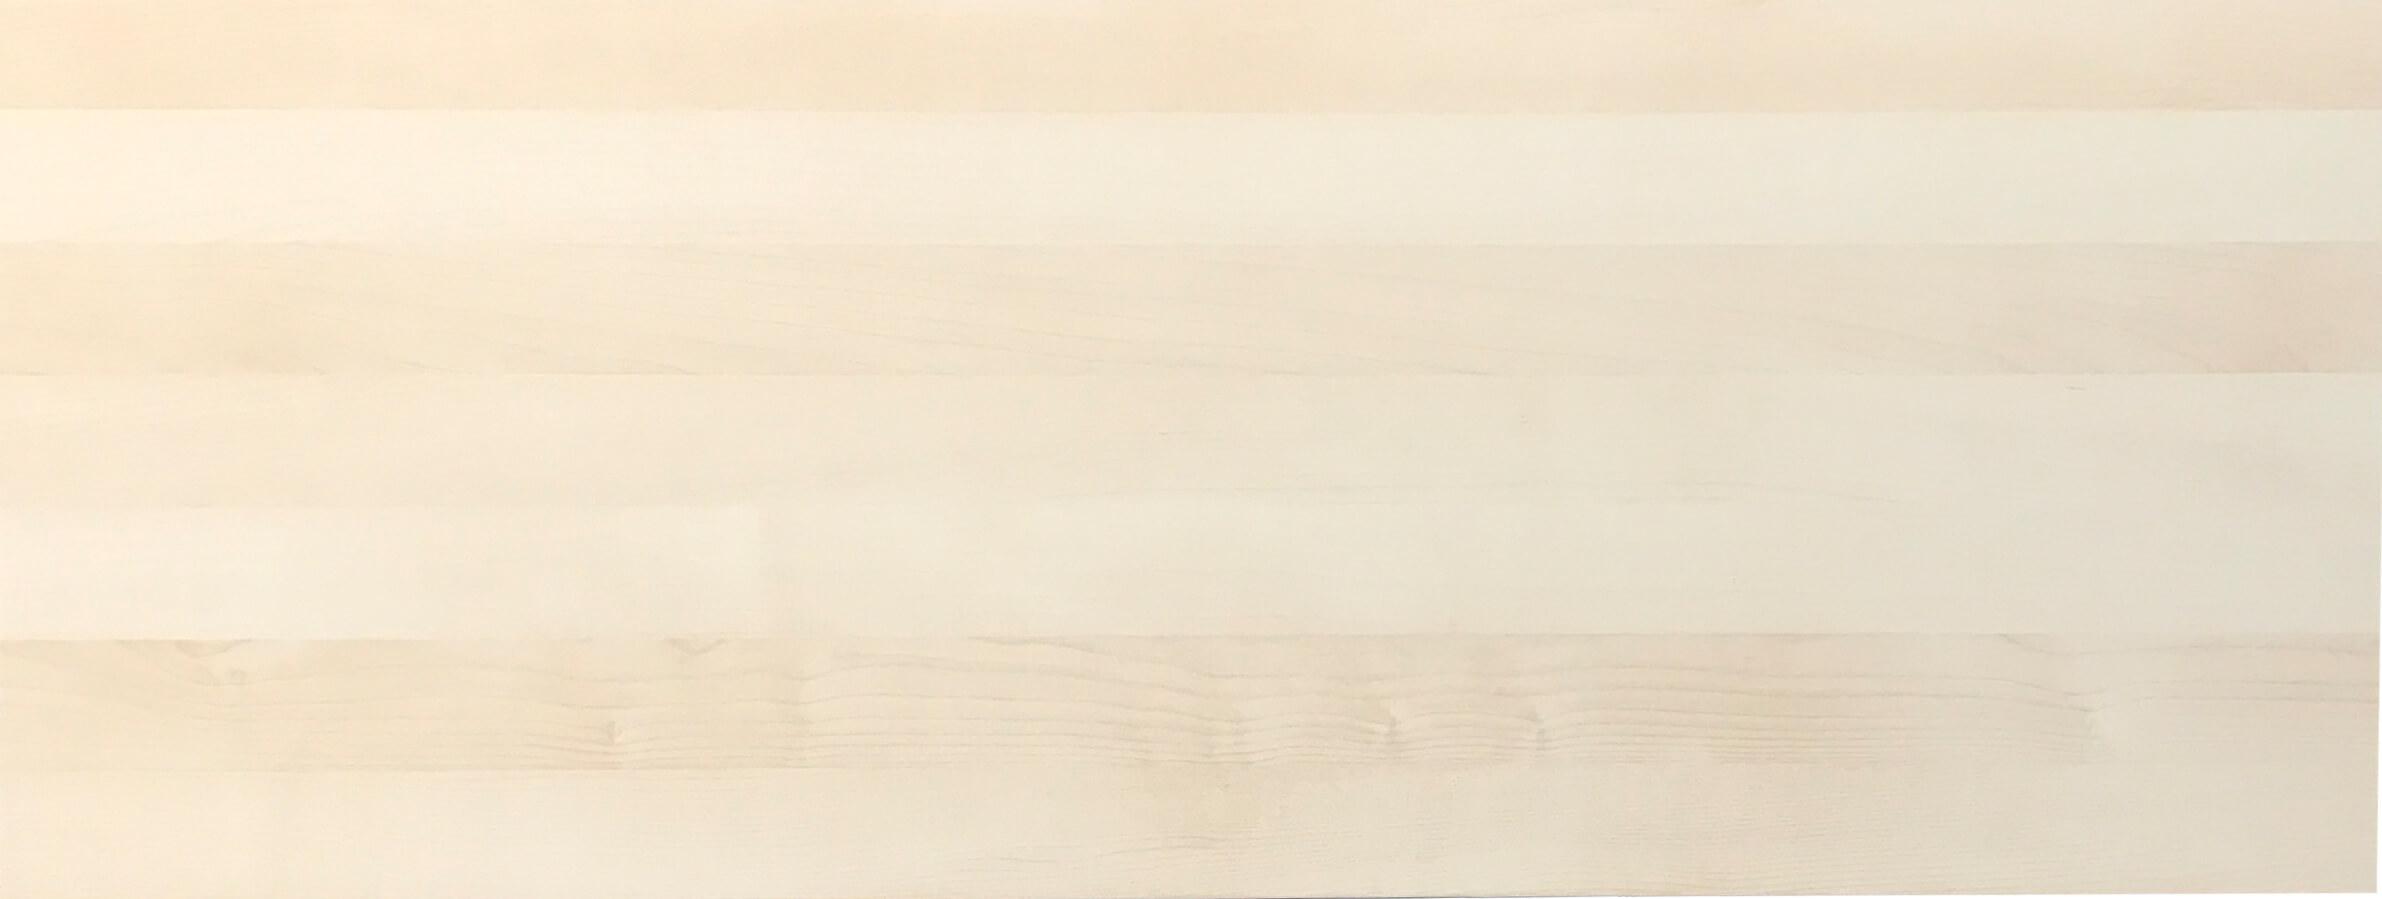 ikea komplement pax regalboden 100x35cm birkenachbildung. Black Bedroom Furniture Sets. Home Design Ideas